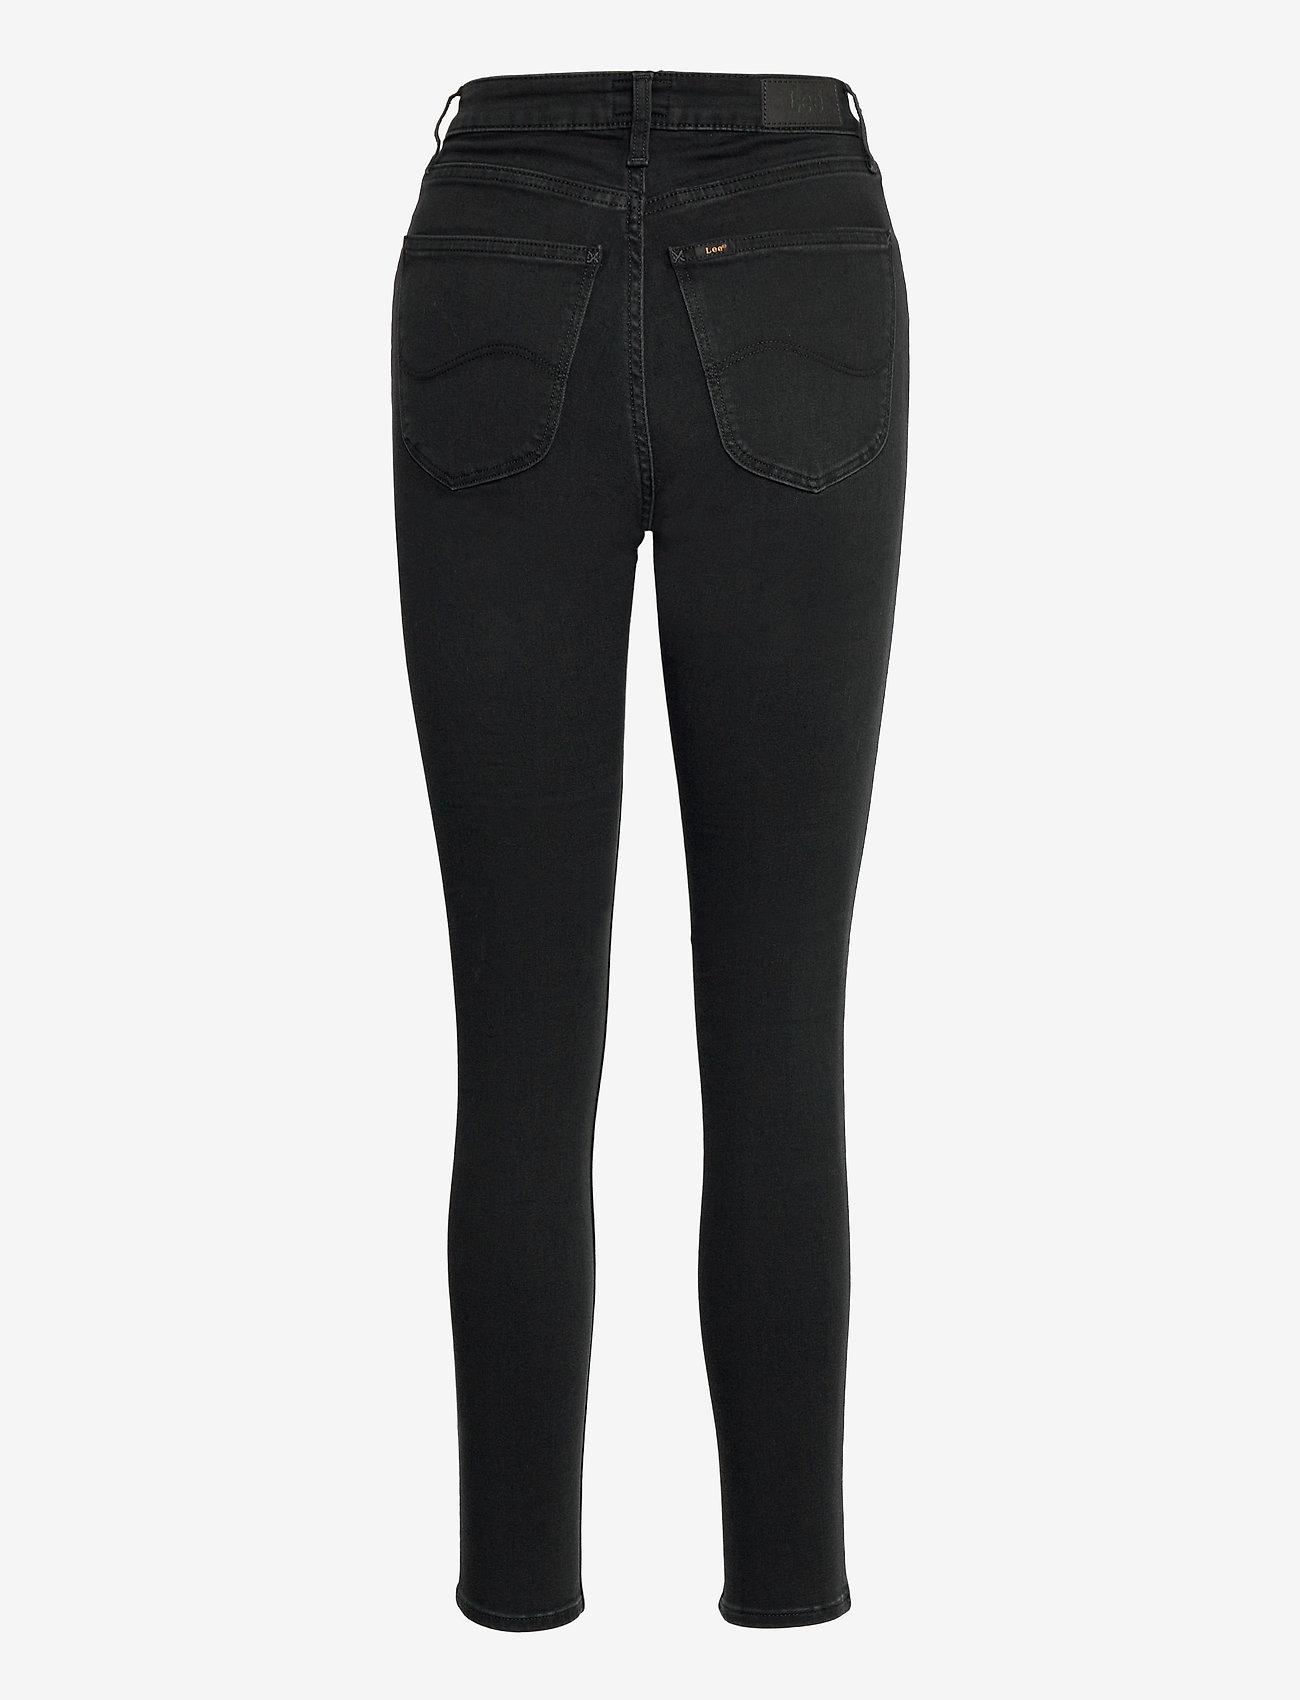 Lee Jeans - IVY - skinny jeans - pavia worn - 1